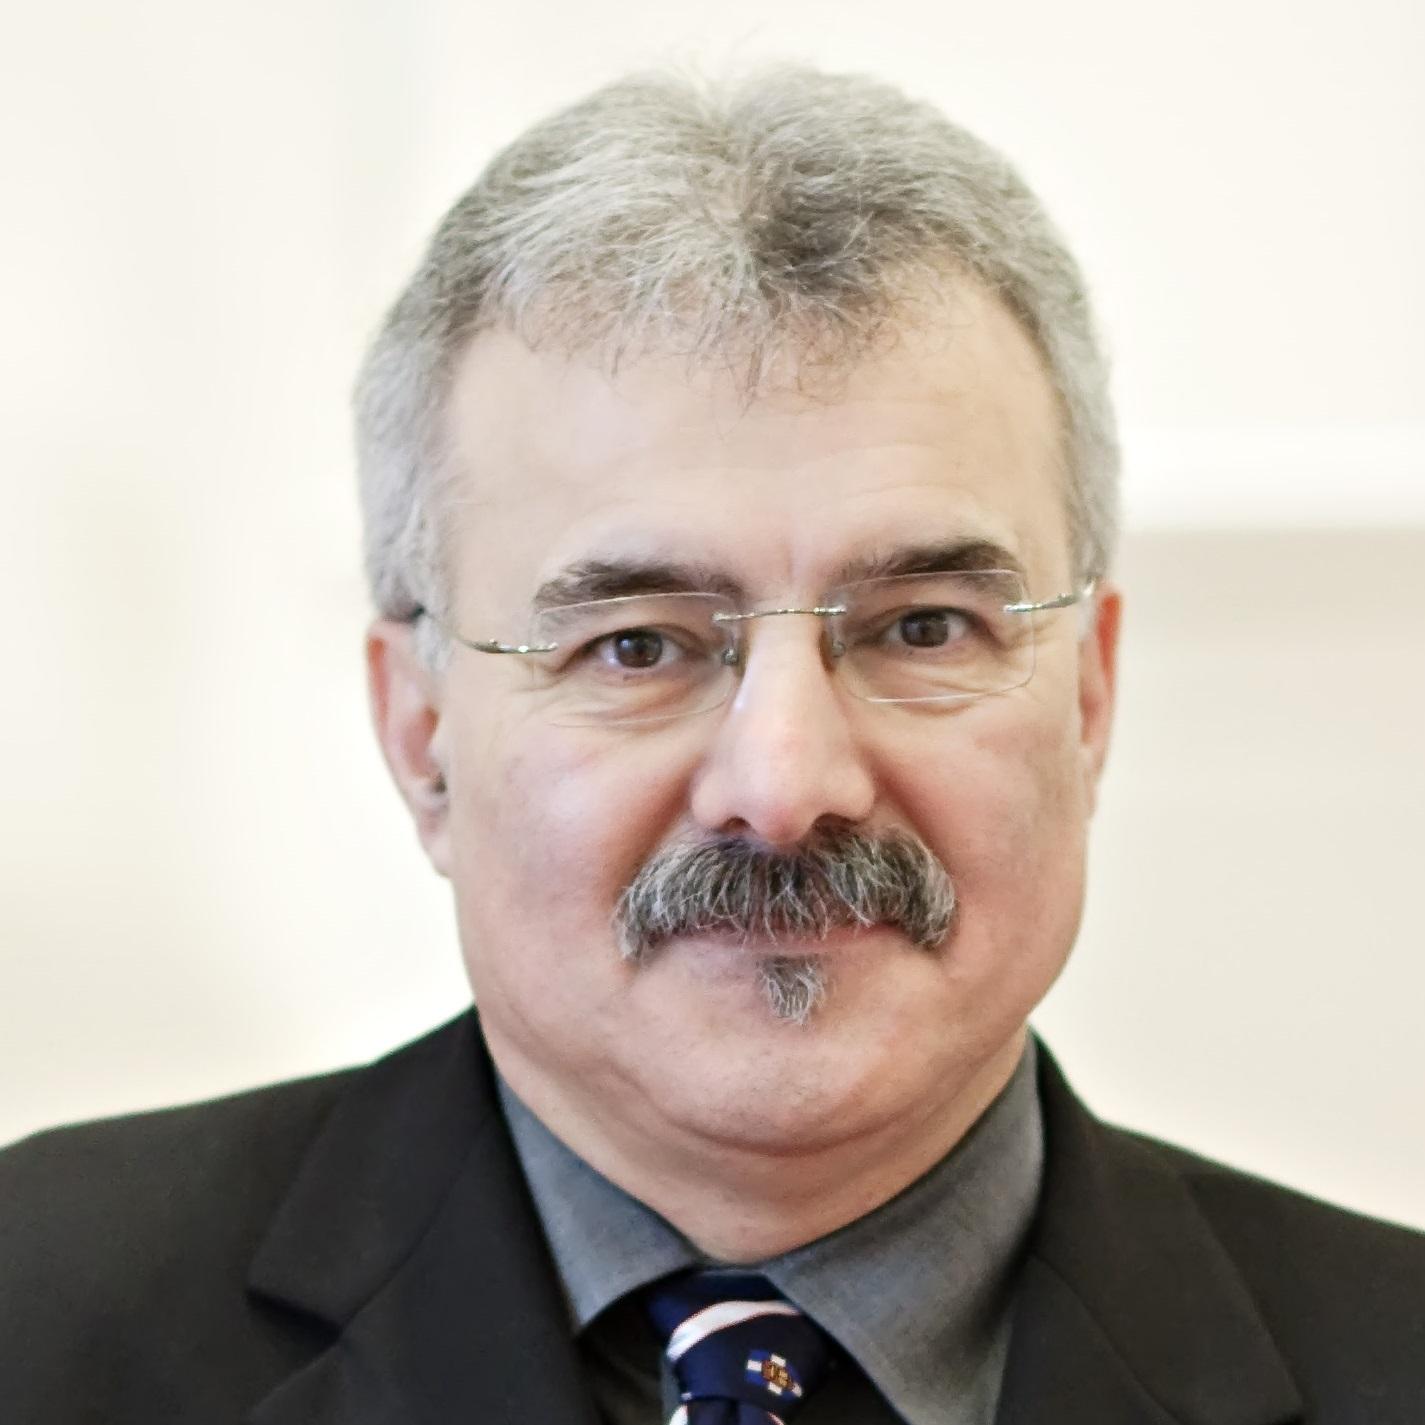 Dr. Michael Haykin